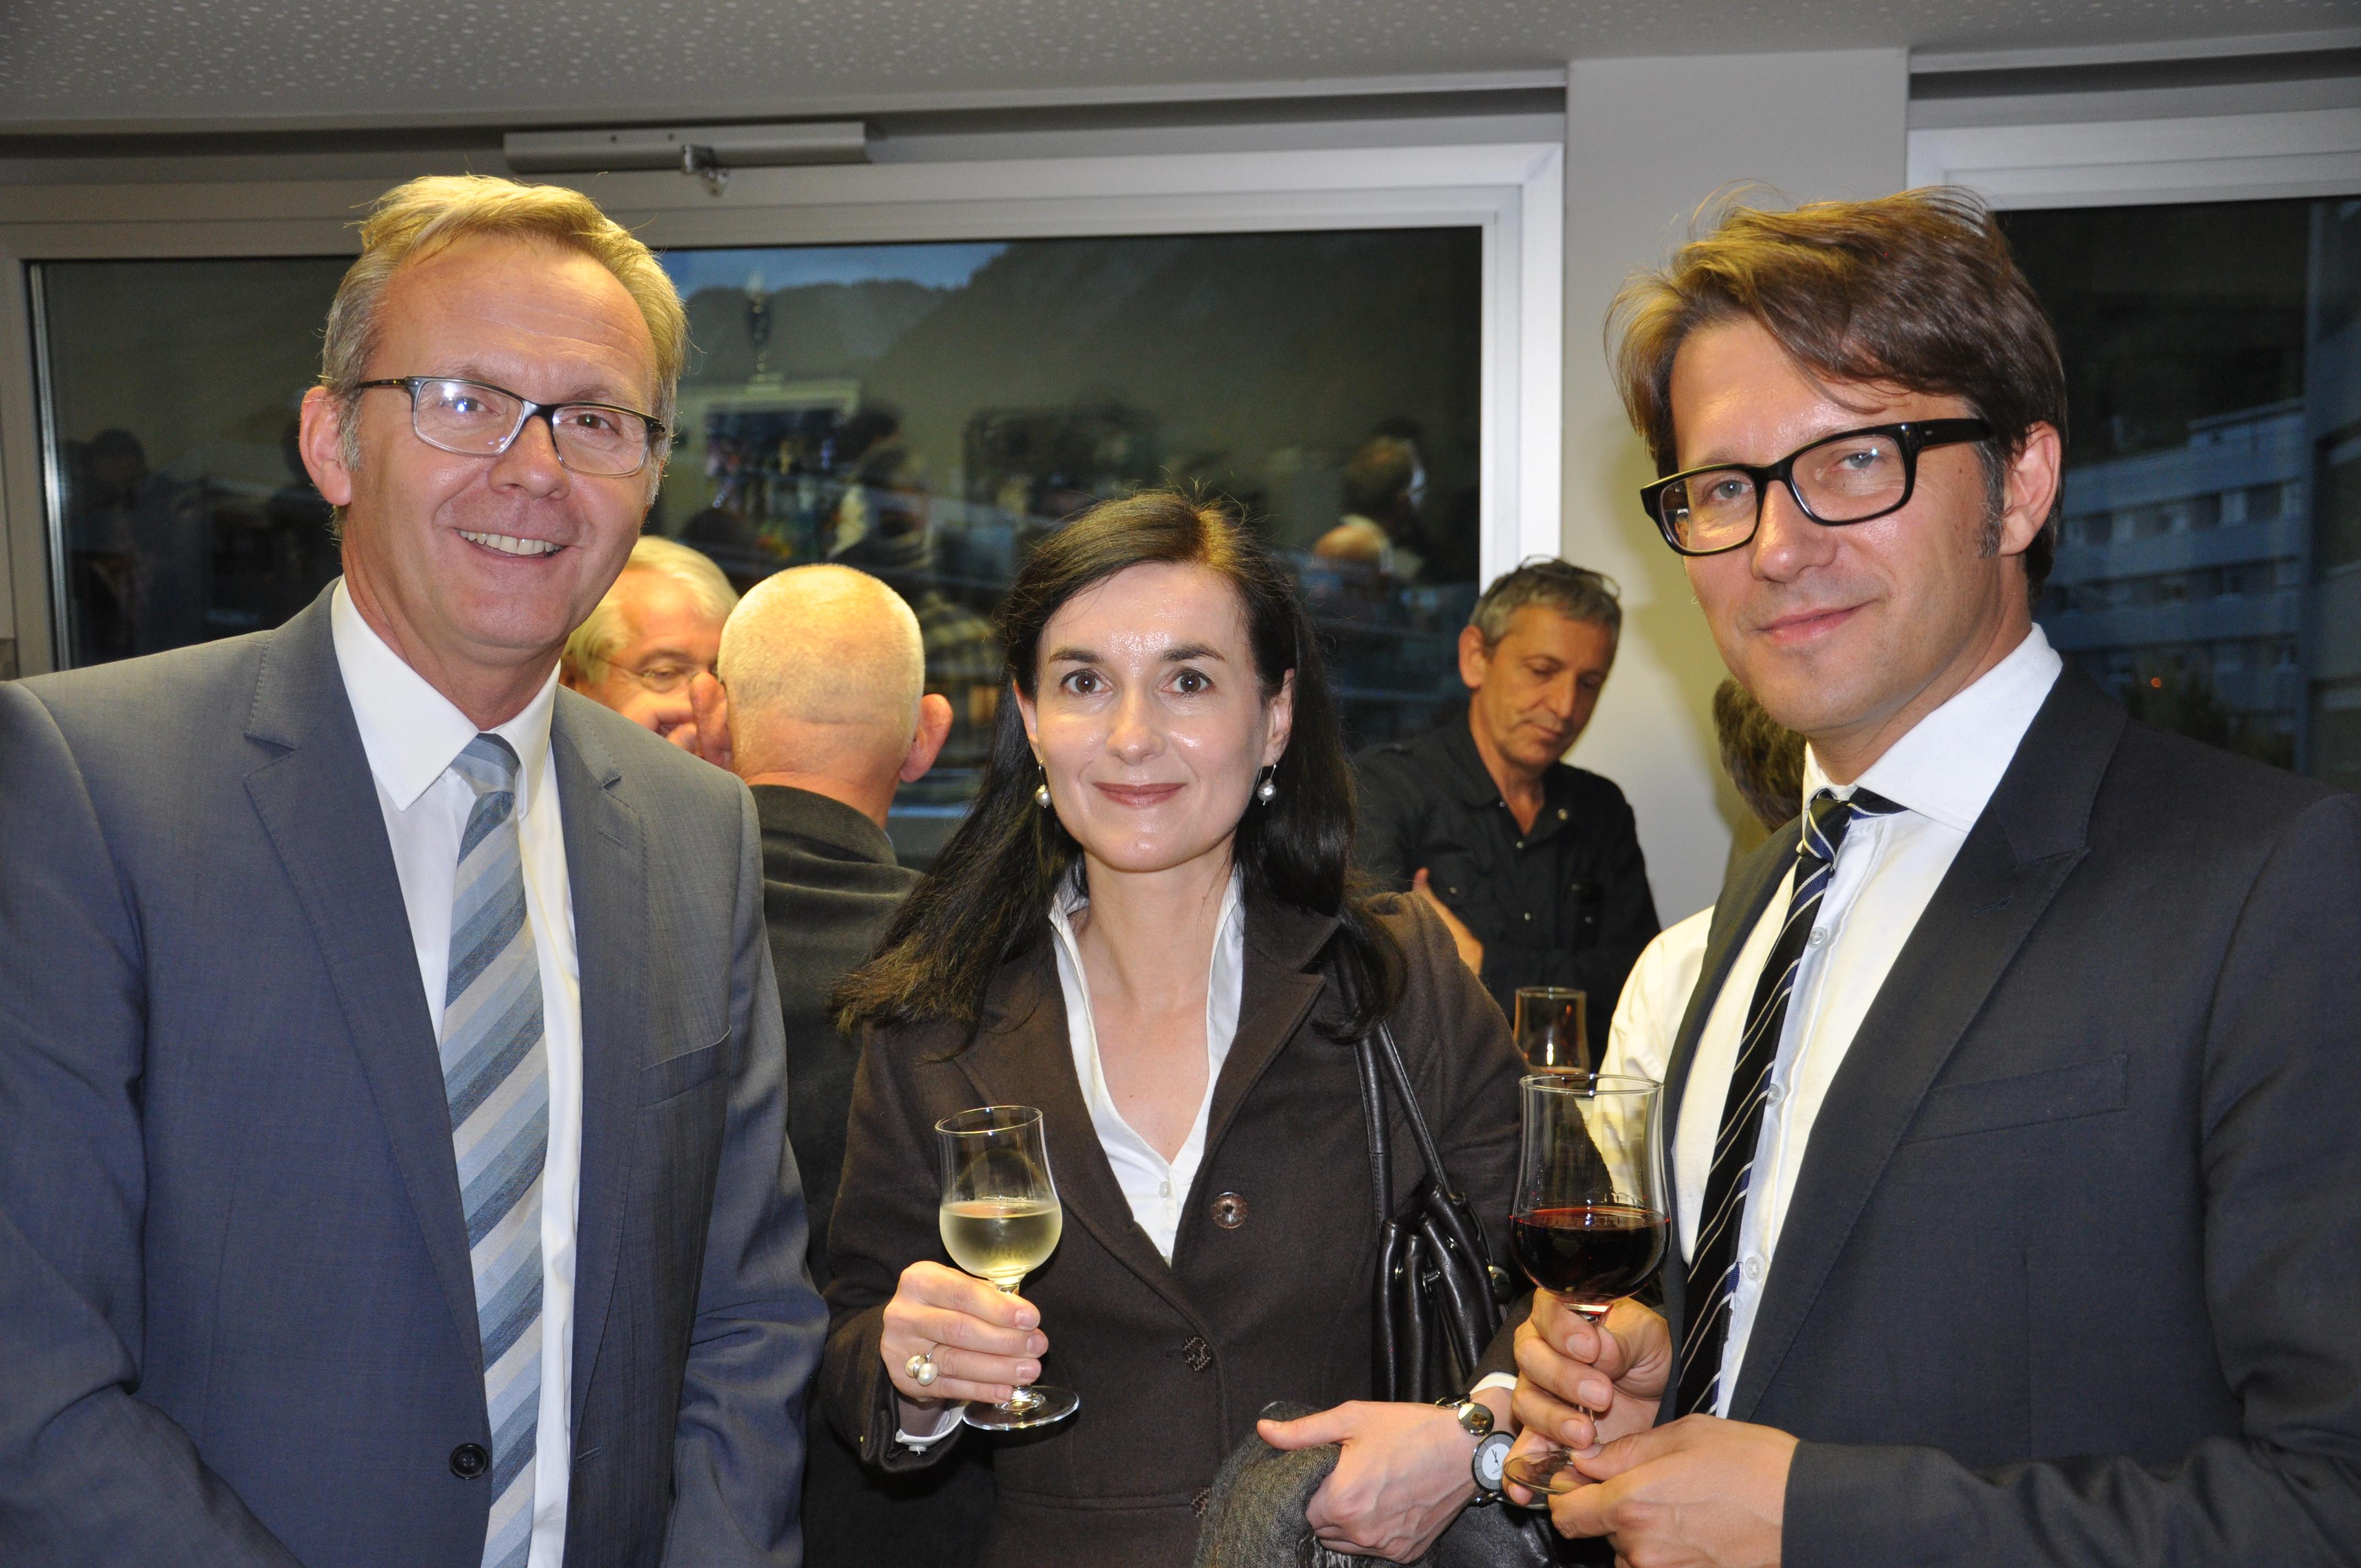 (da san.) Mariano Tschuor, directur RTR; Barbara Gabrielli, manadra uffizi da cultura chantun Grischun; Andrew Holland, directur Pro Helvetia.